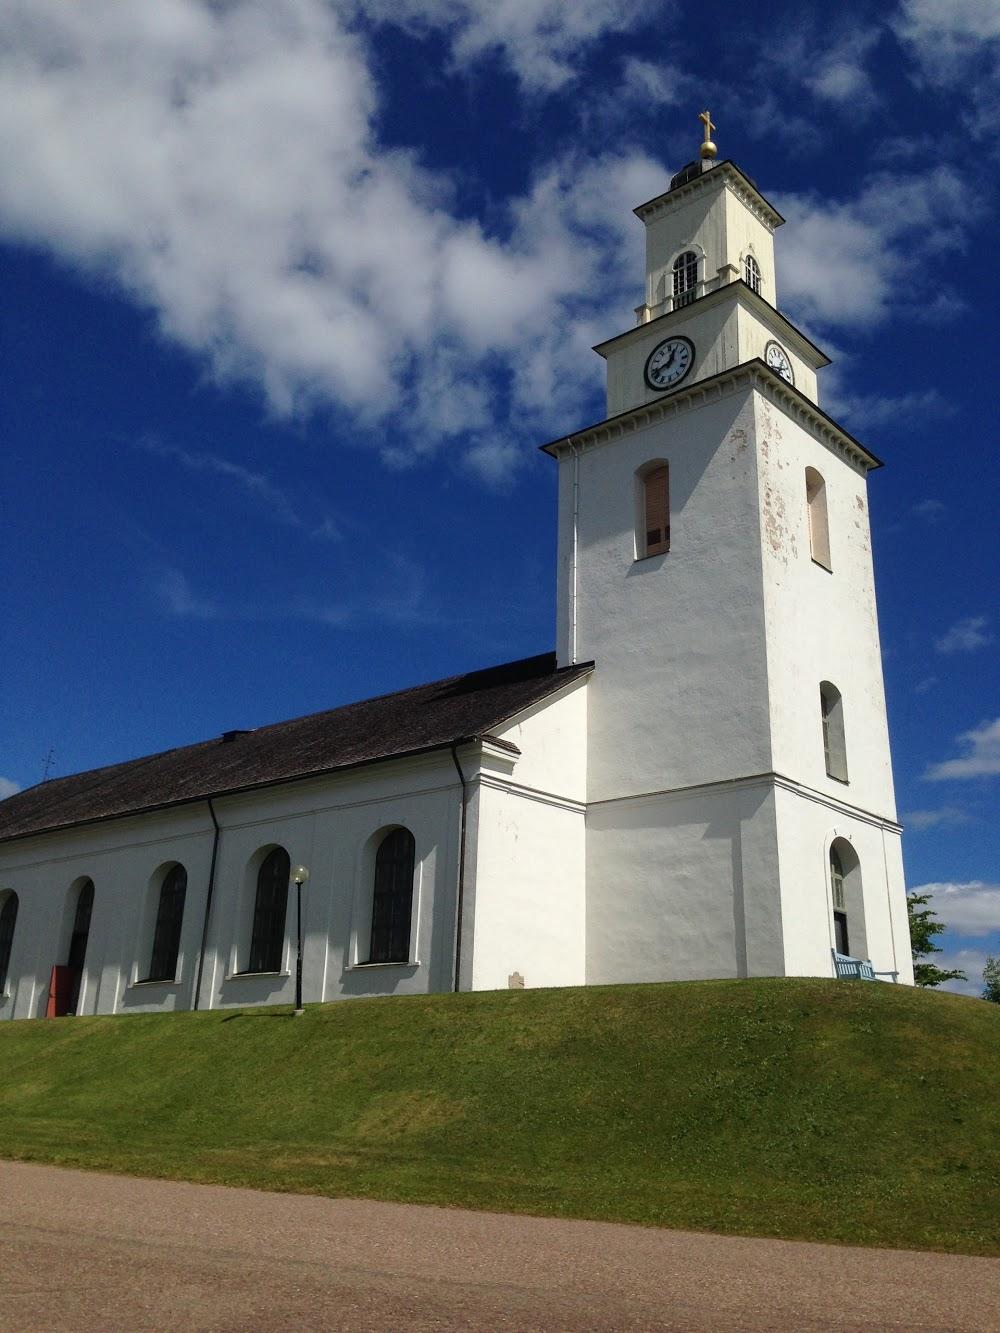 Bingsjö kyrka